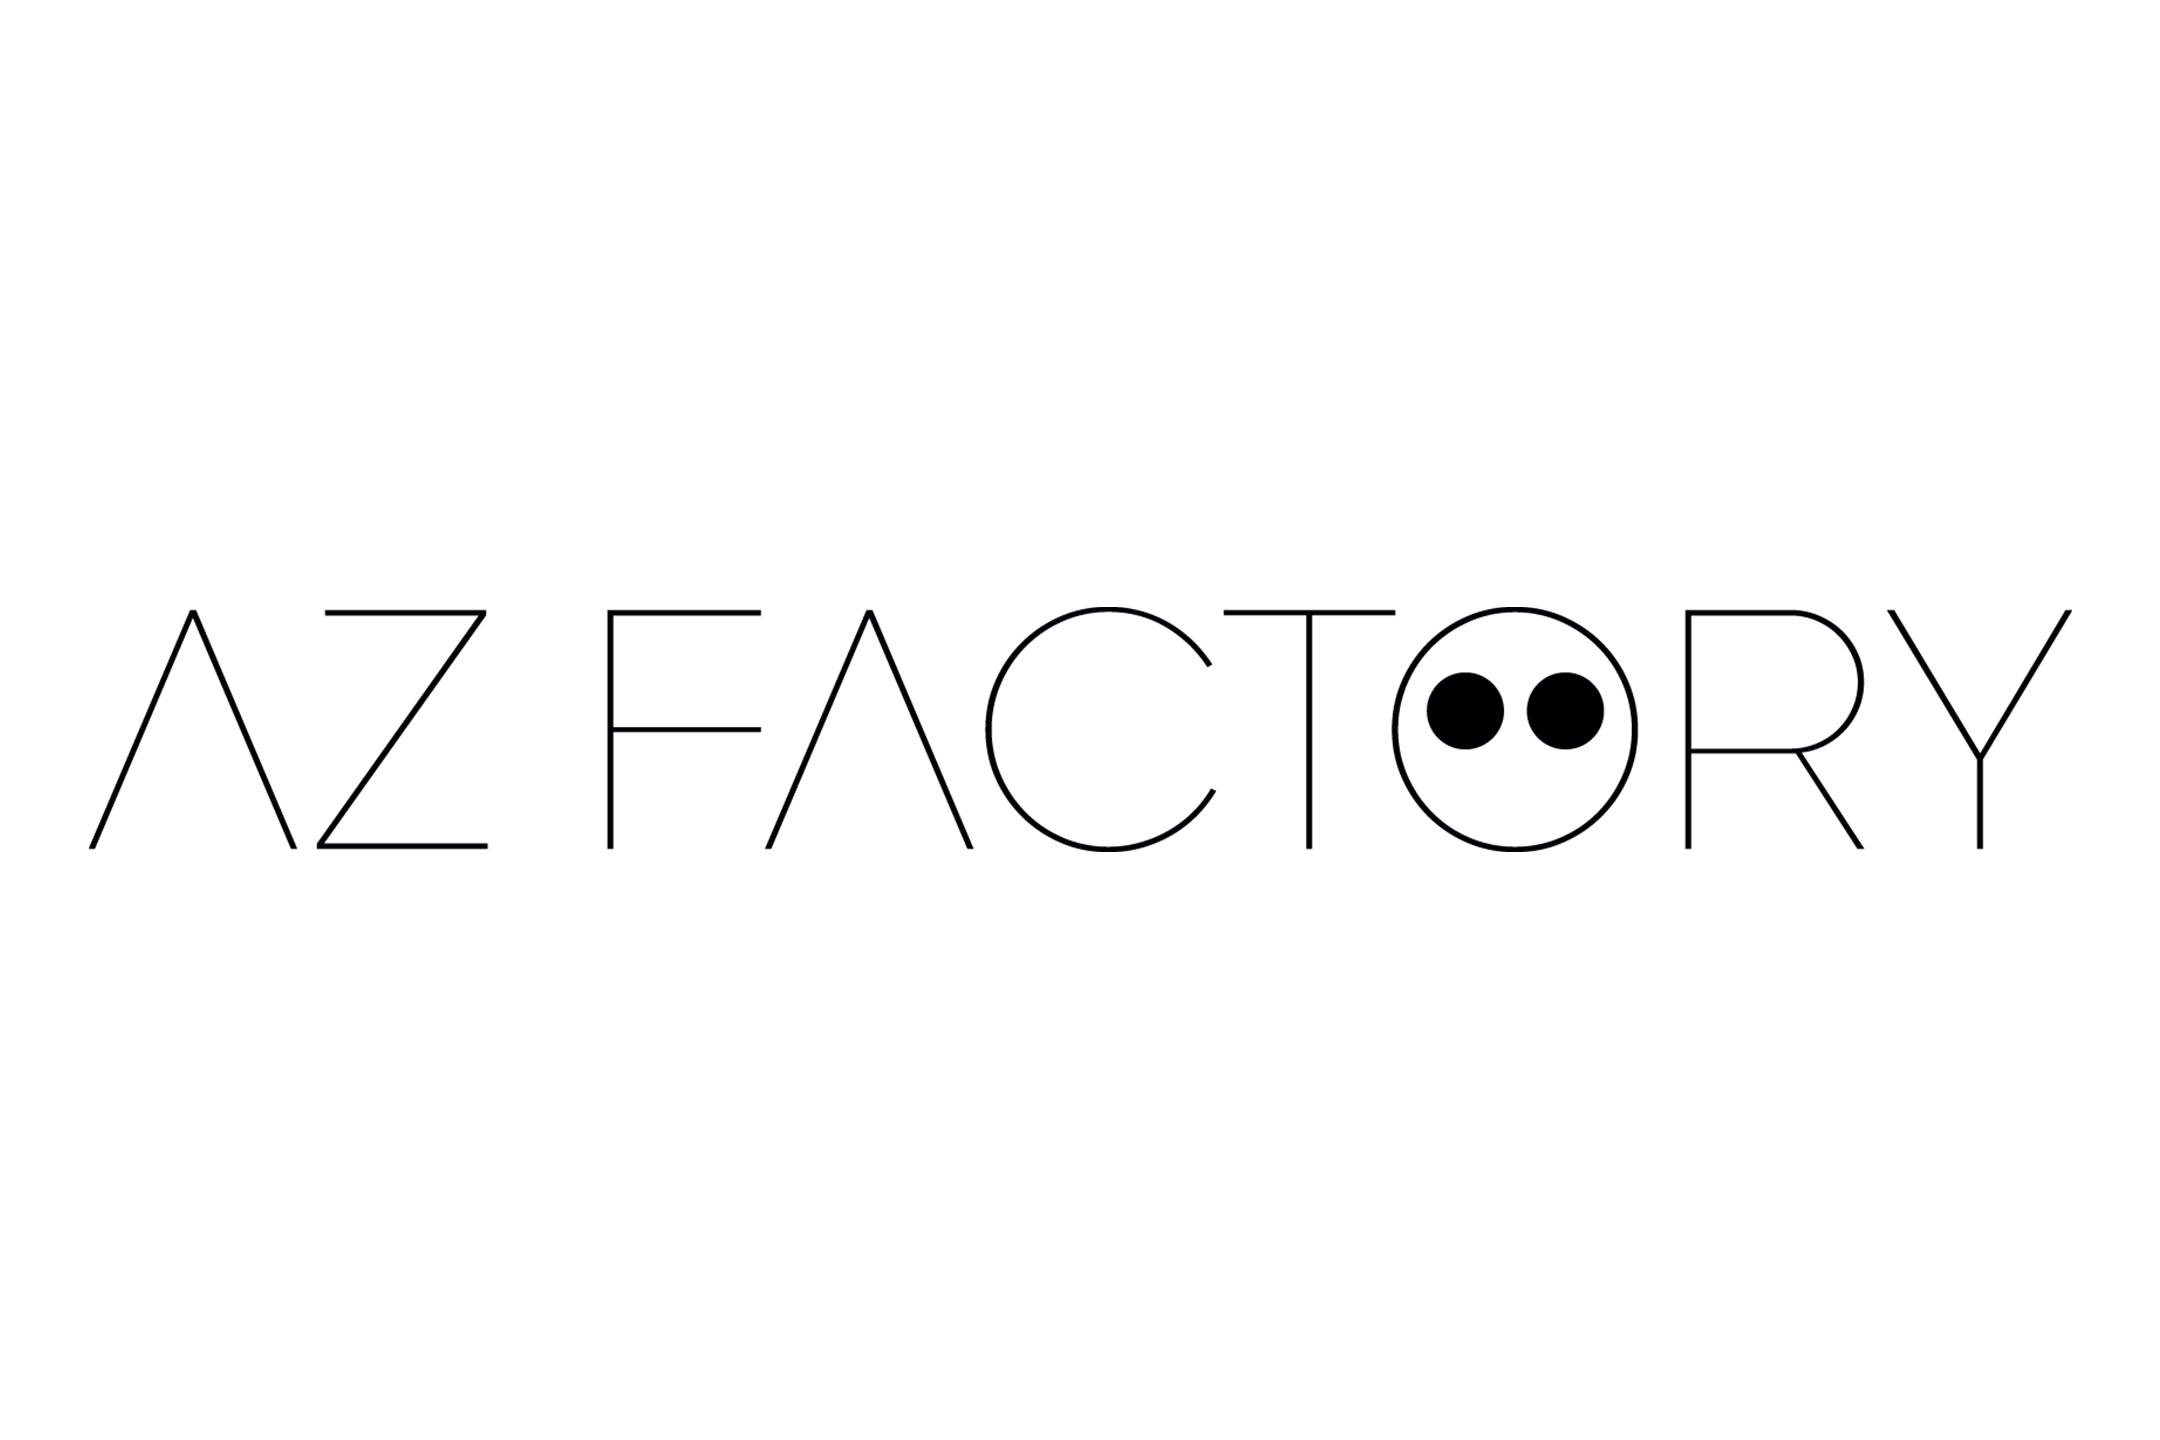 Alber Elbaz即將發布的個人品牌名為AZ Factory